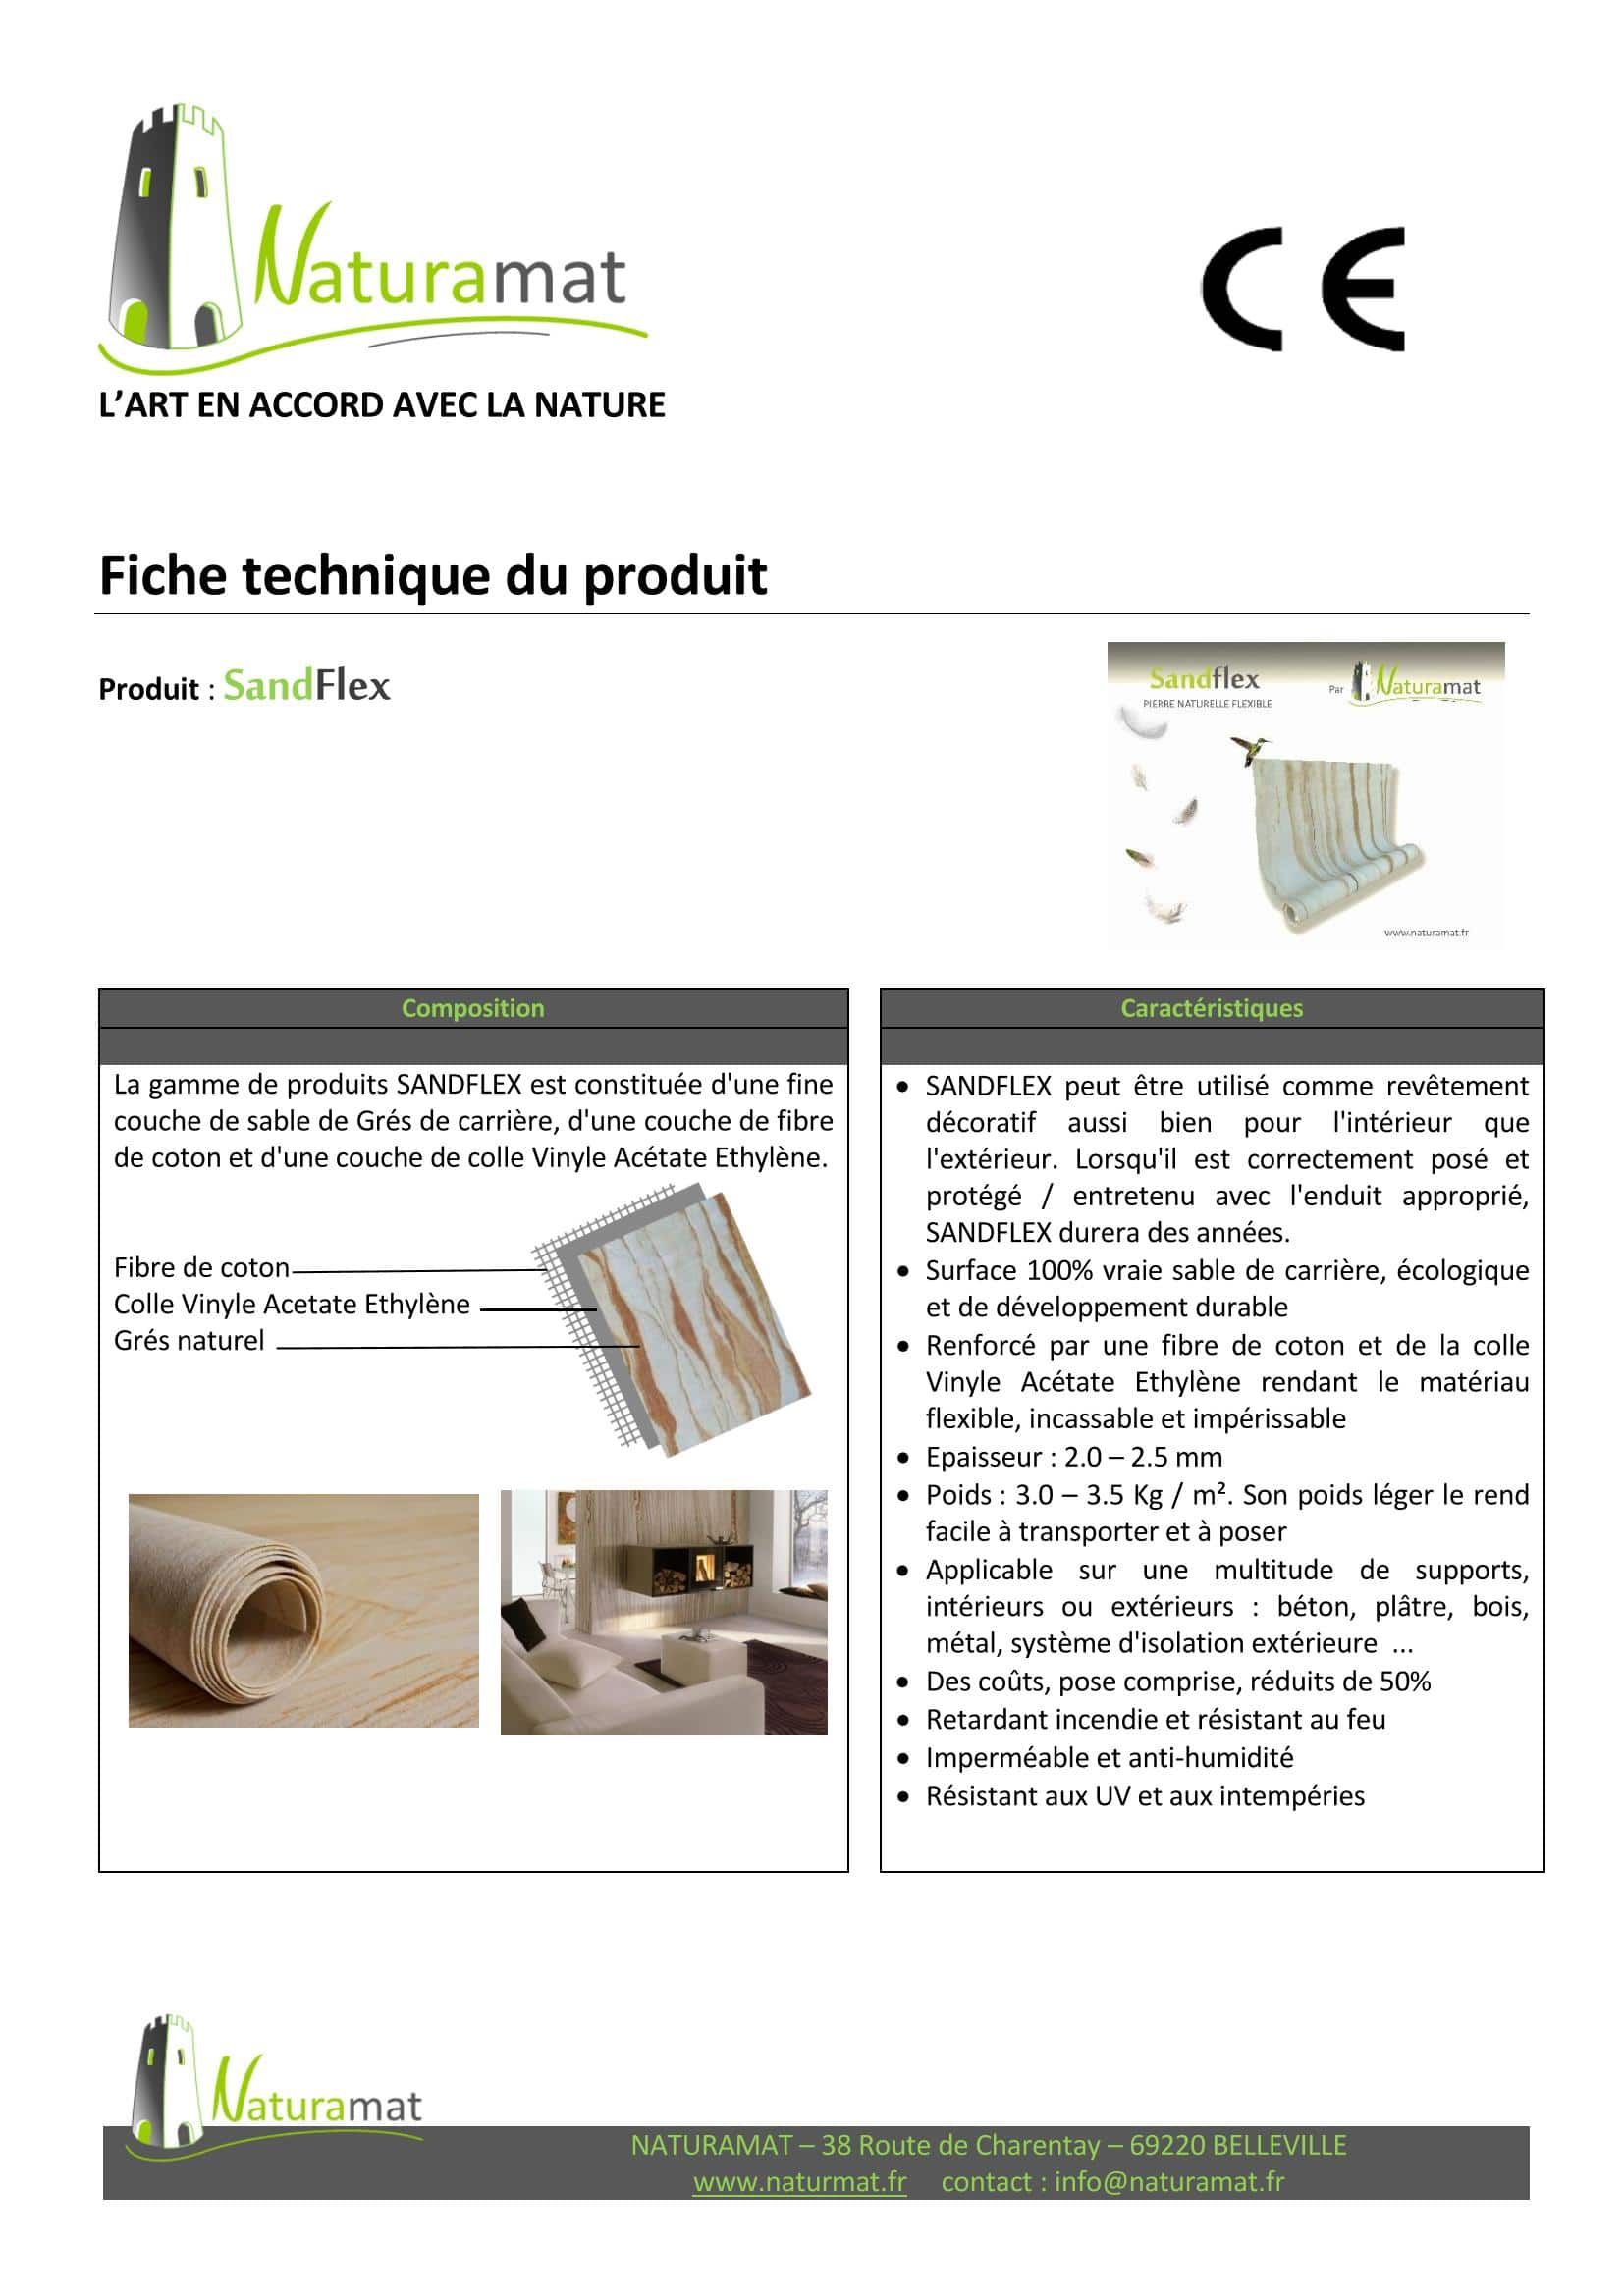 Fiche Technique Designflex NATURAMAT